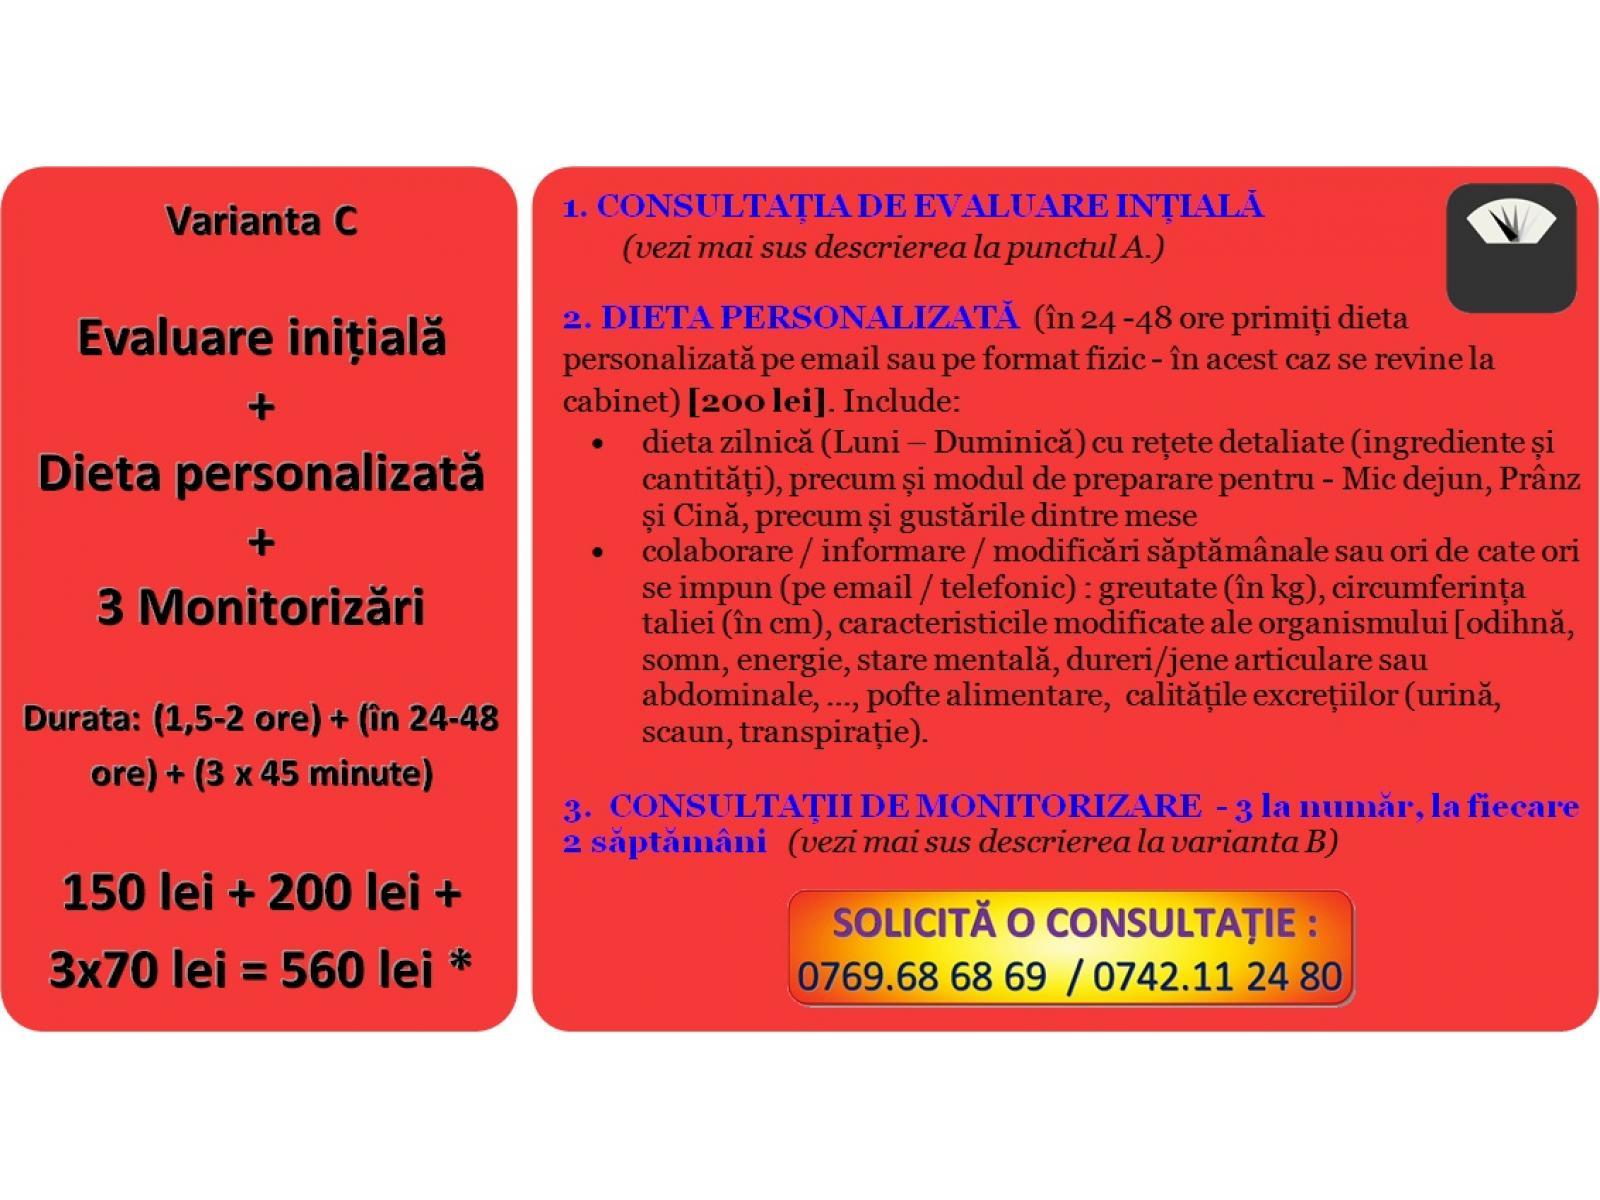 Cabinet de Nutritie si Dietetica - Constantin Tibirna - Program_individual_Varianta_C.jpg